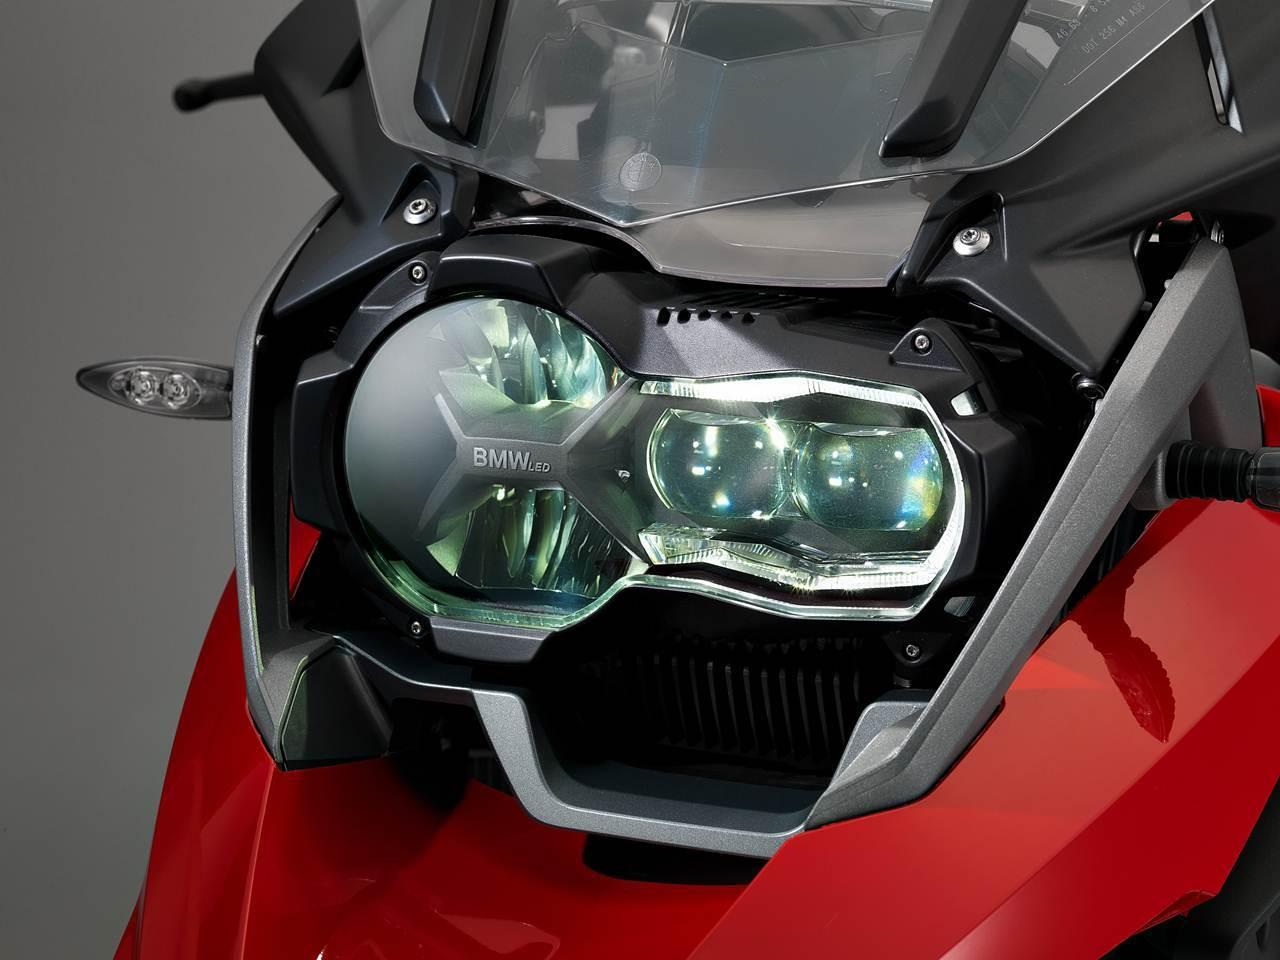 BMW R1200GS 2013, detalles